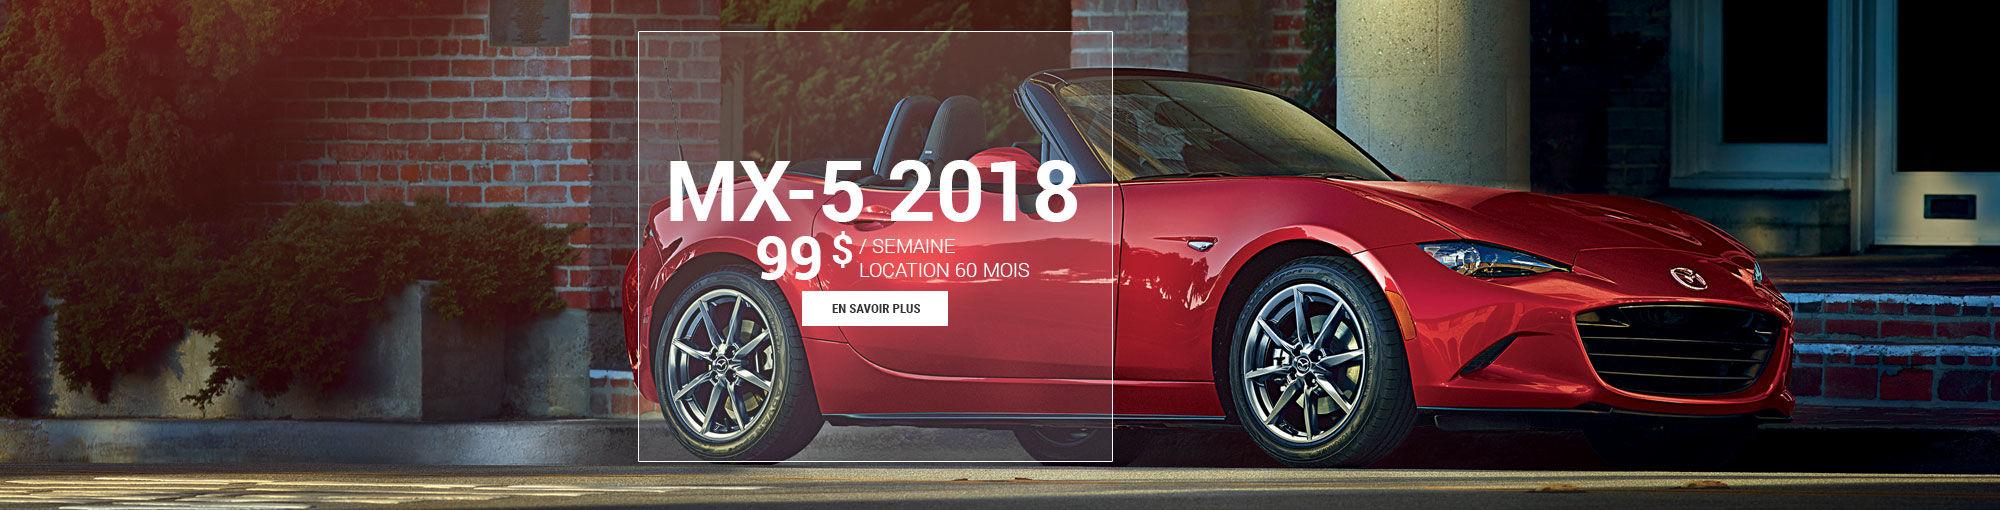 Mazda mx-5 2018 - mai